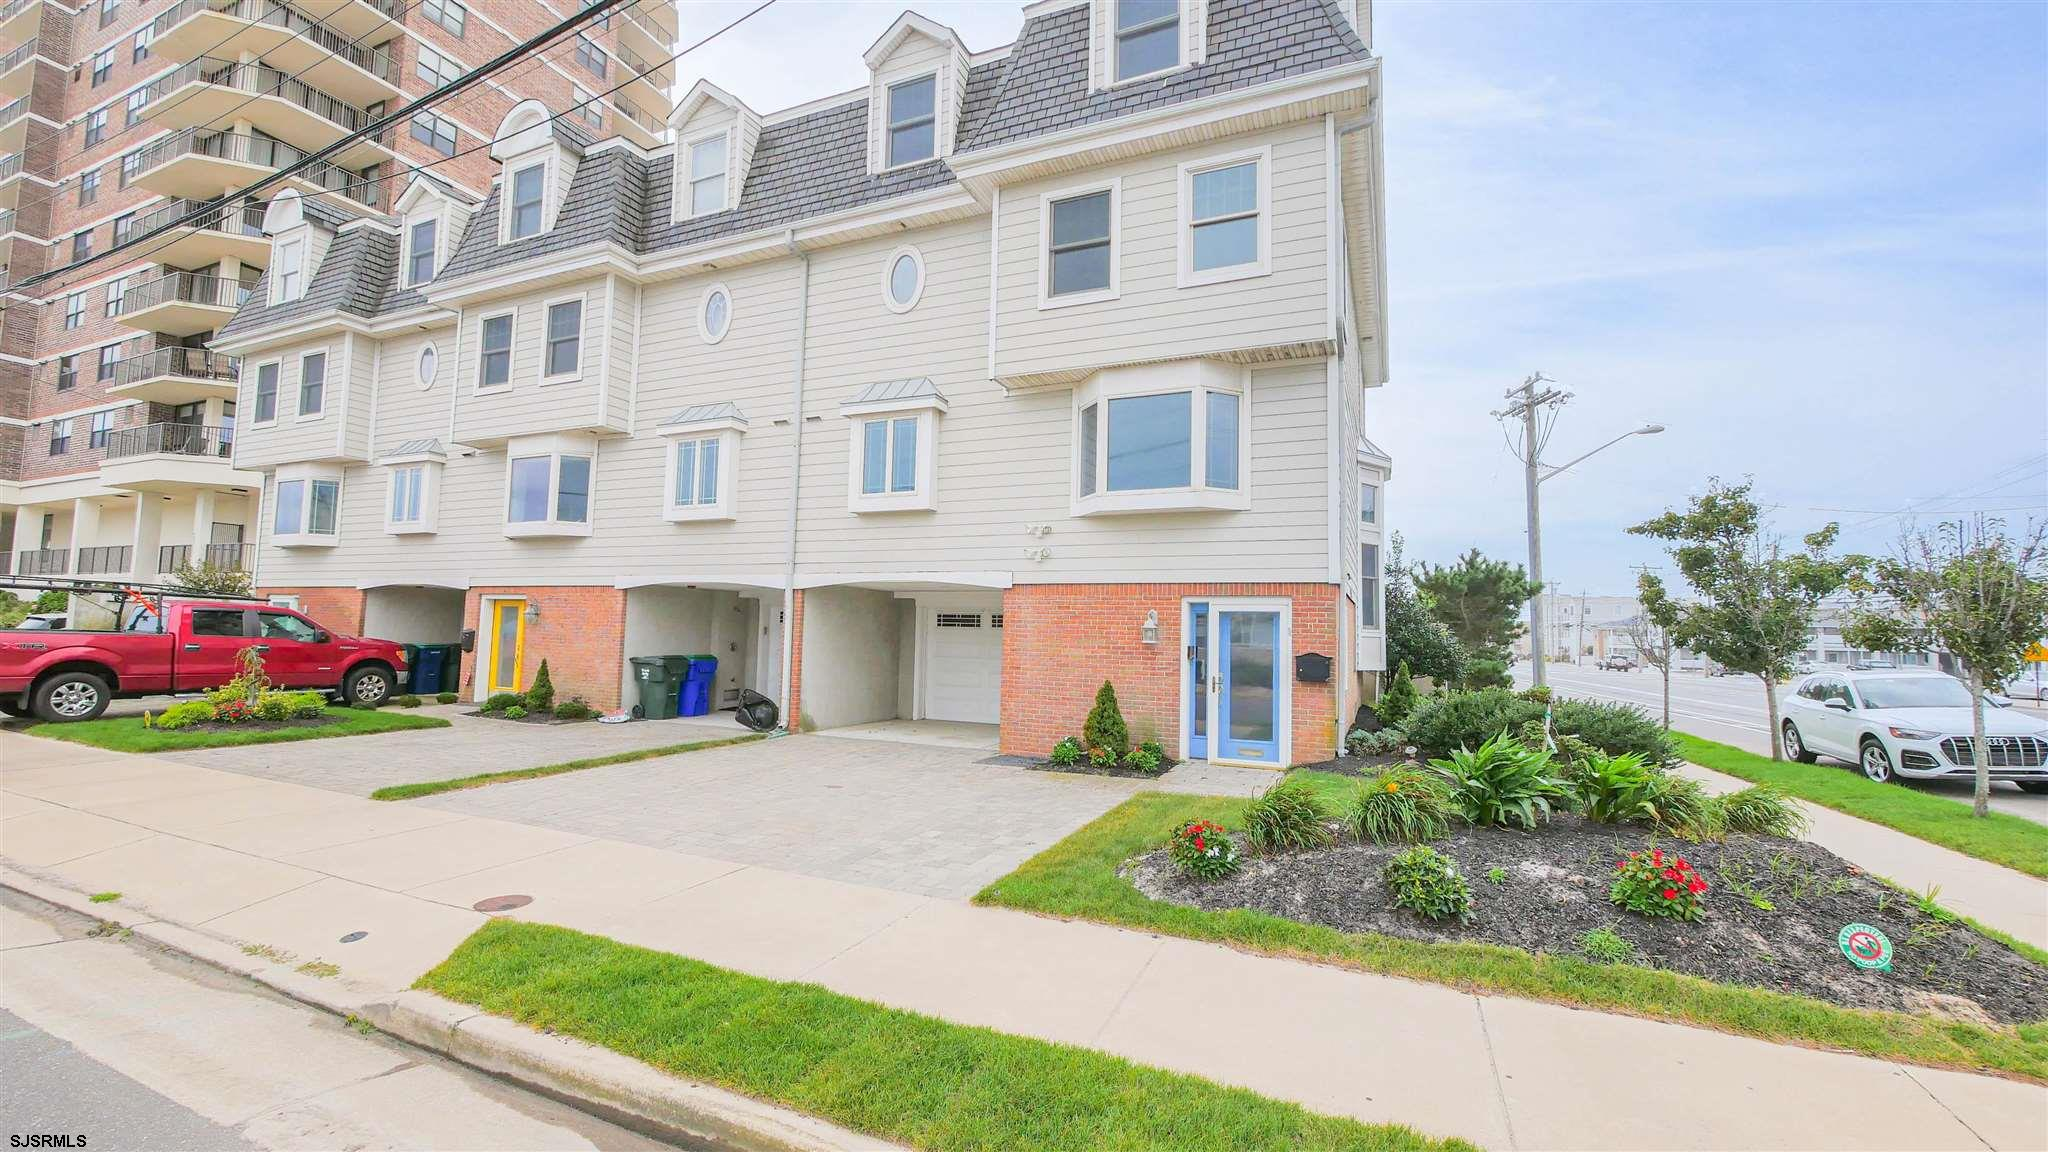 9100 Atlantic Ave, Margate, NJ 08402